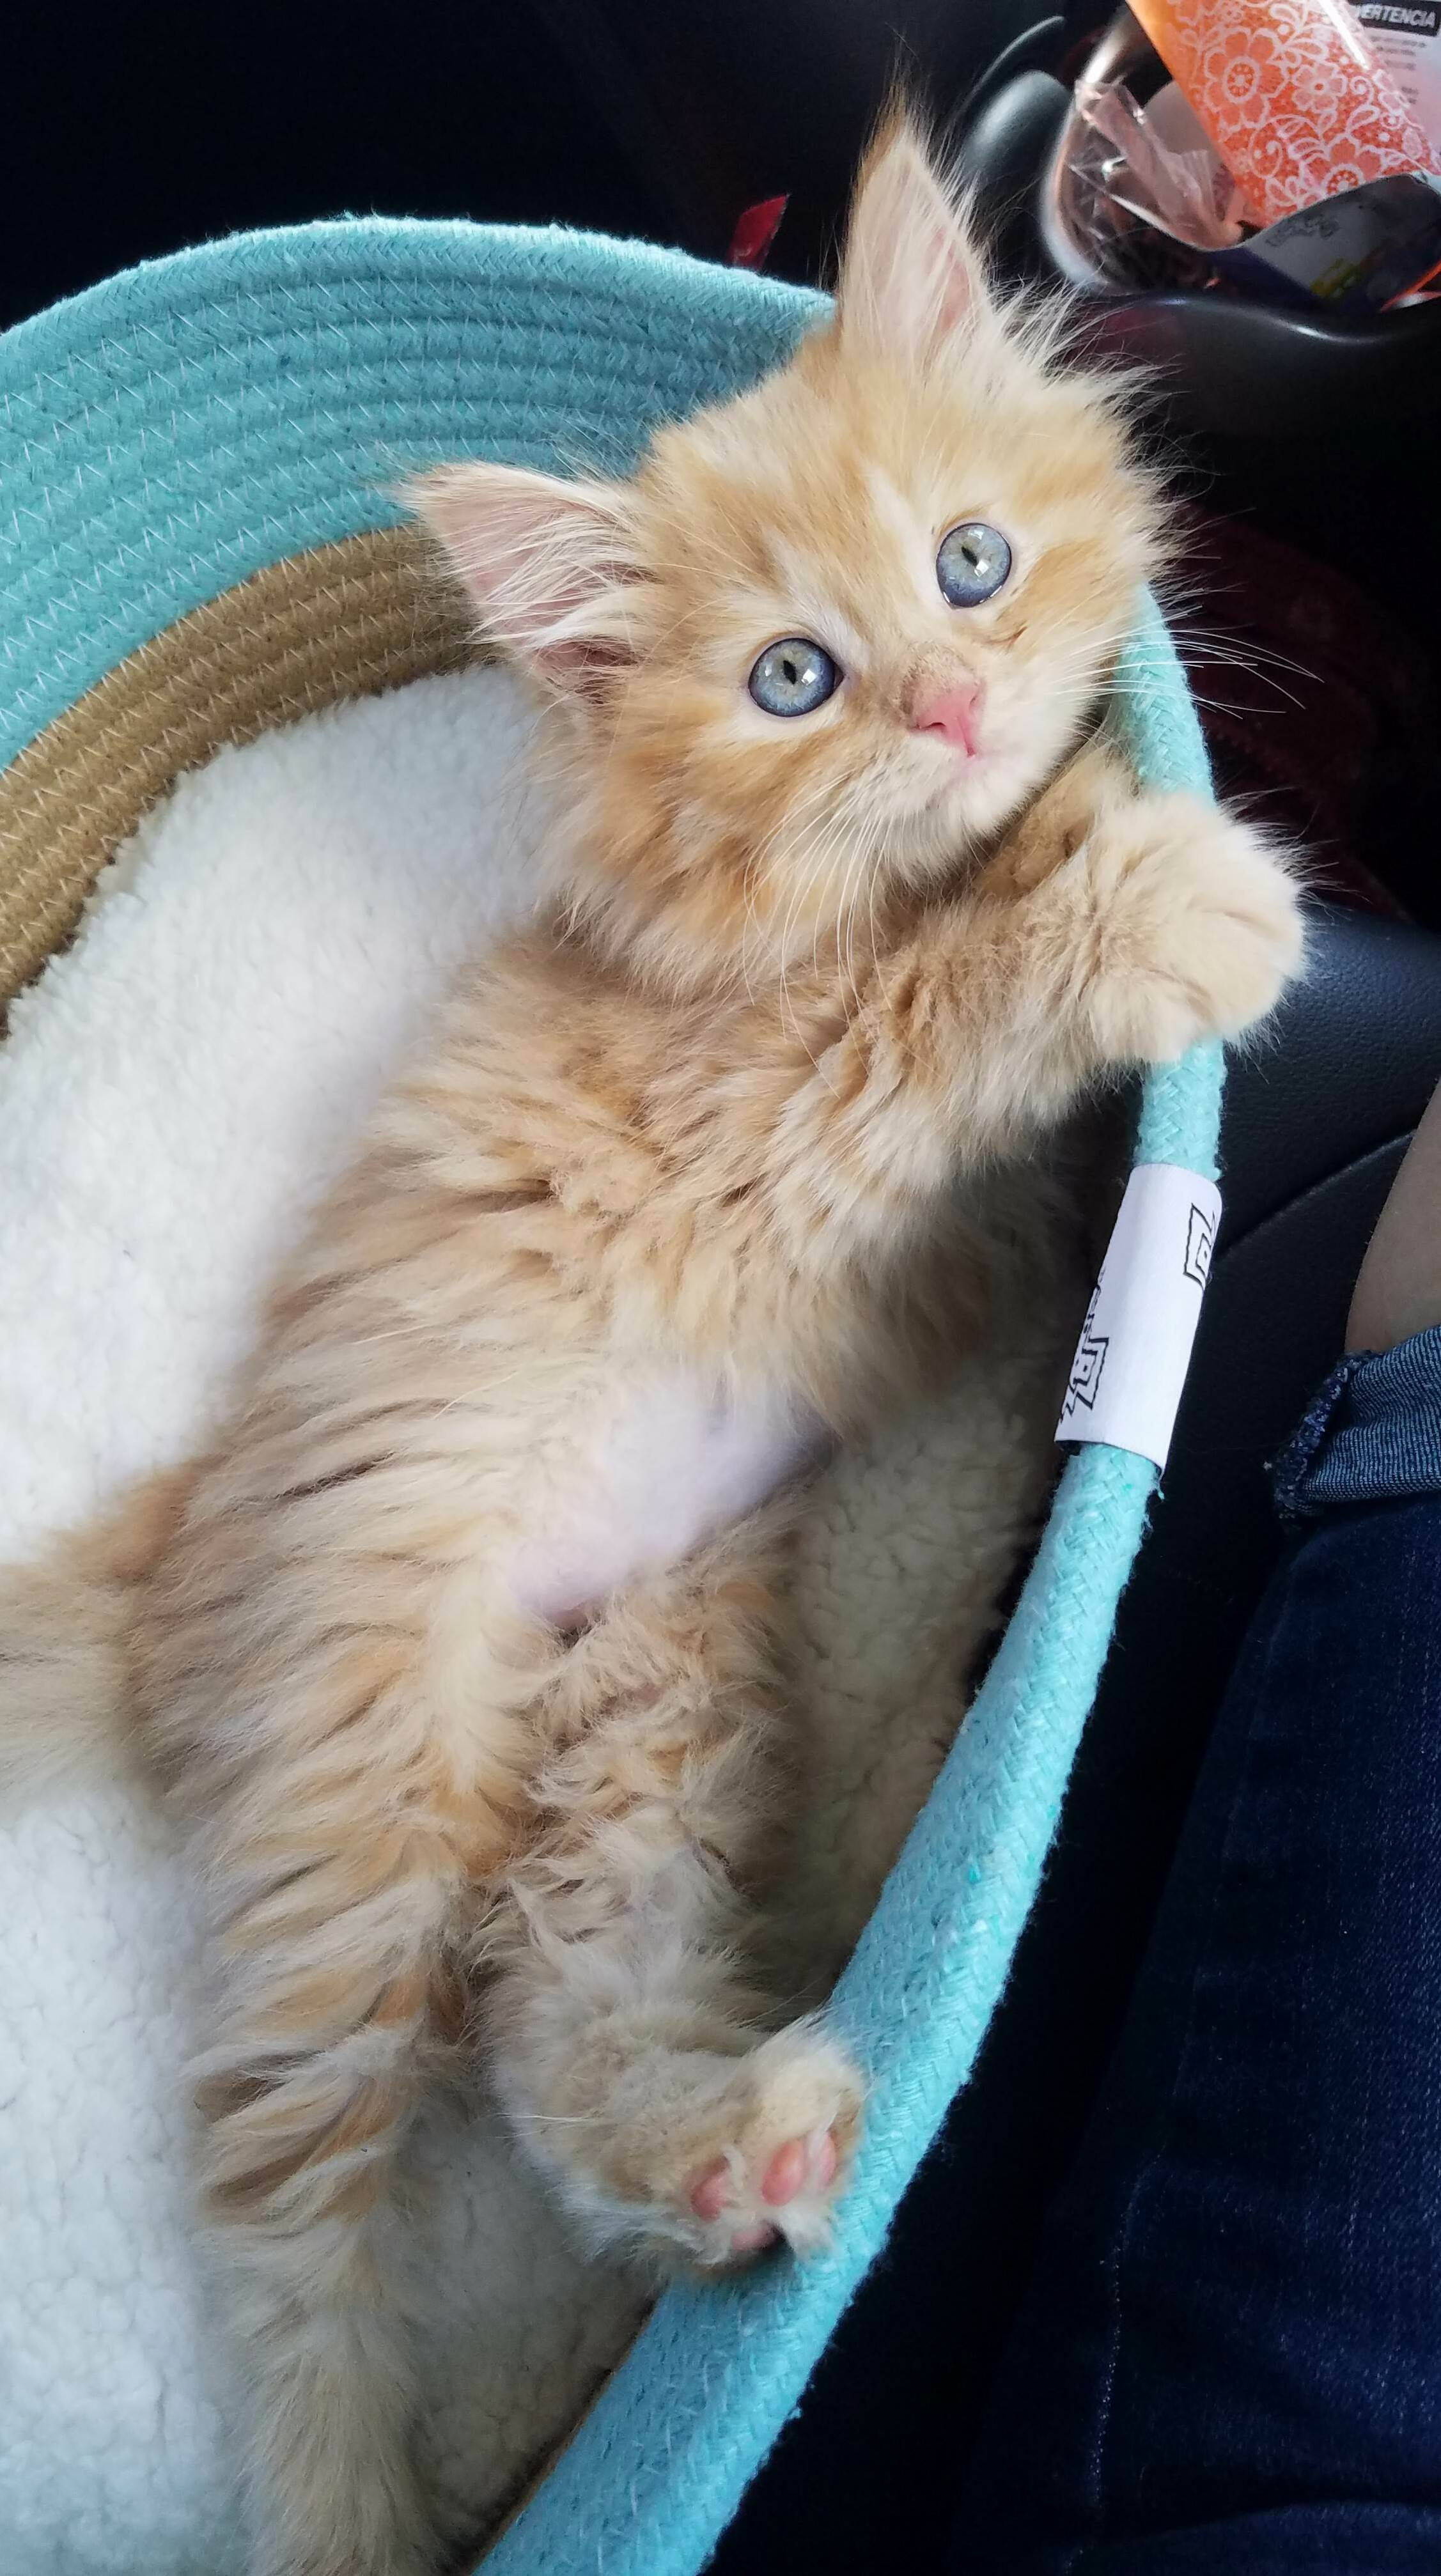 My new baby, tigger!